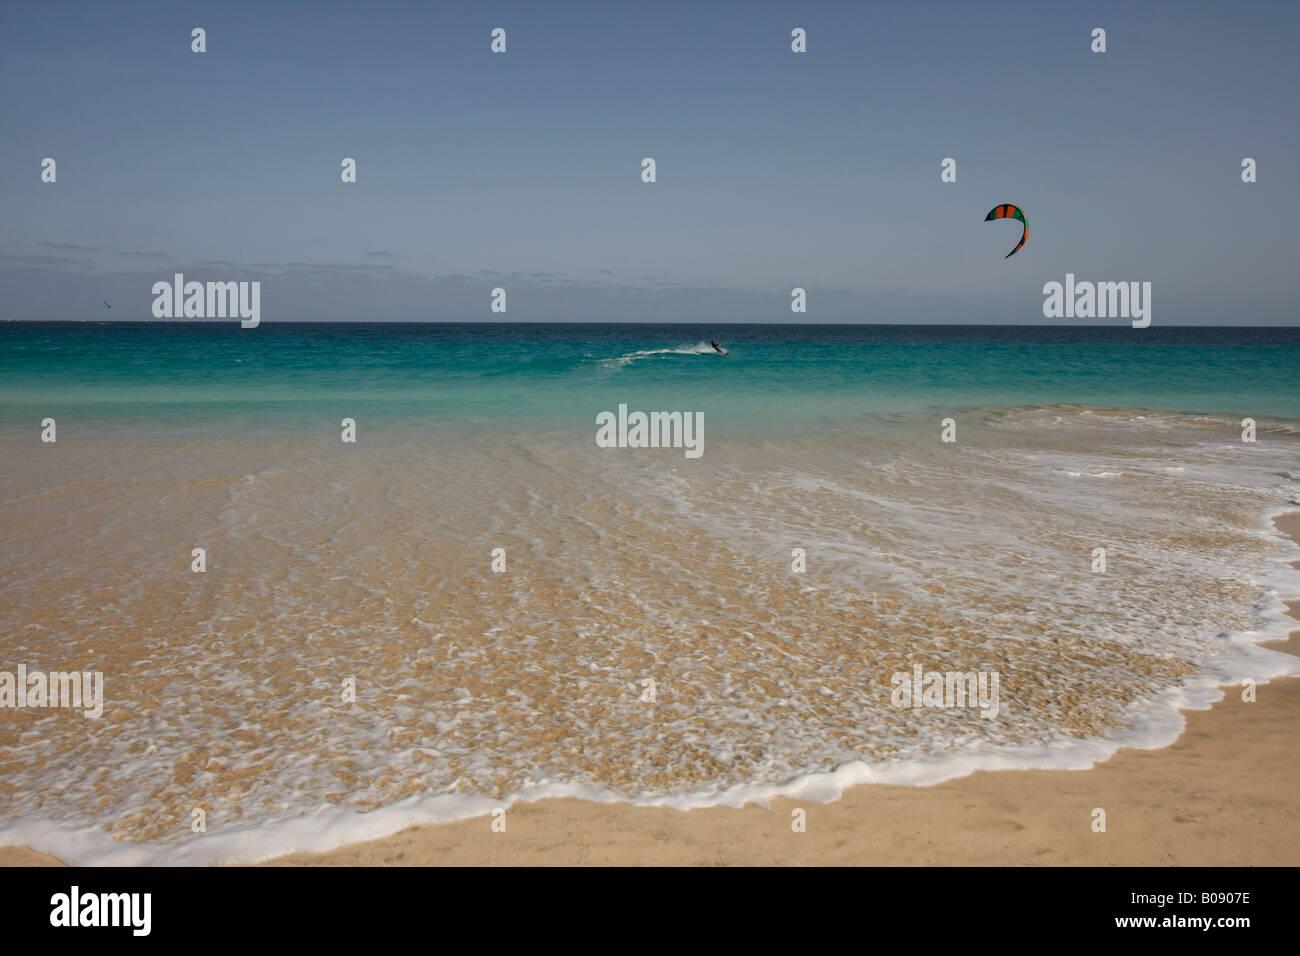 Kitesurfer, Santa Maria, Sal Island, Cape Verde, Africa Stock Photo